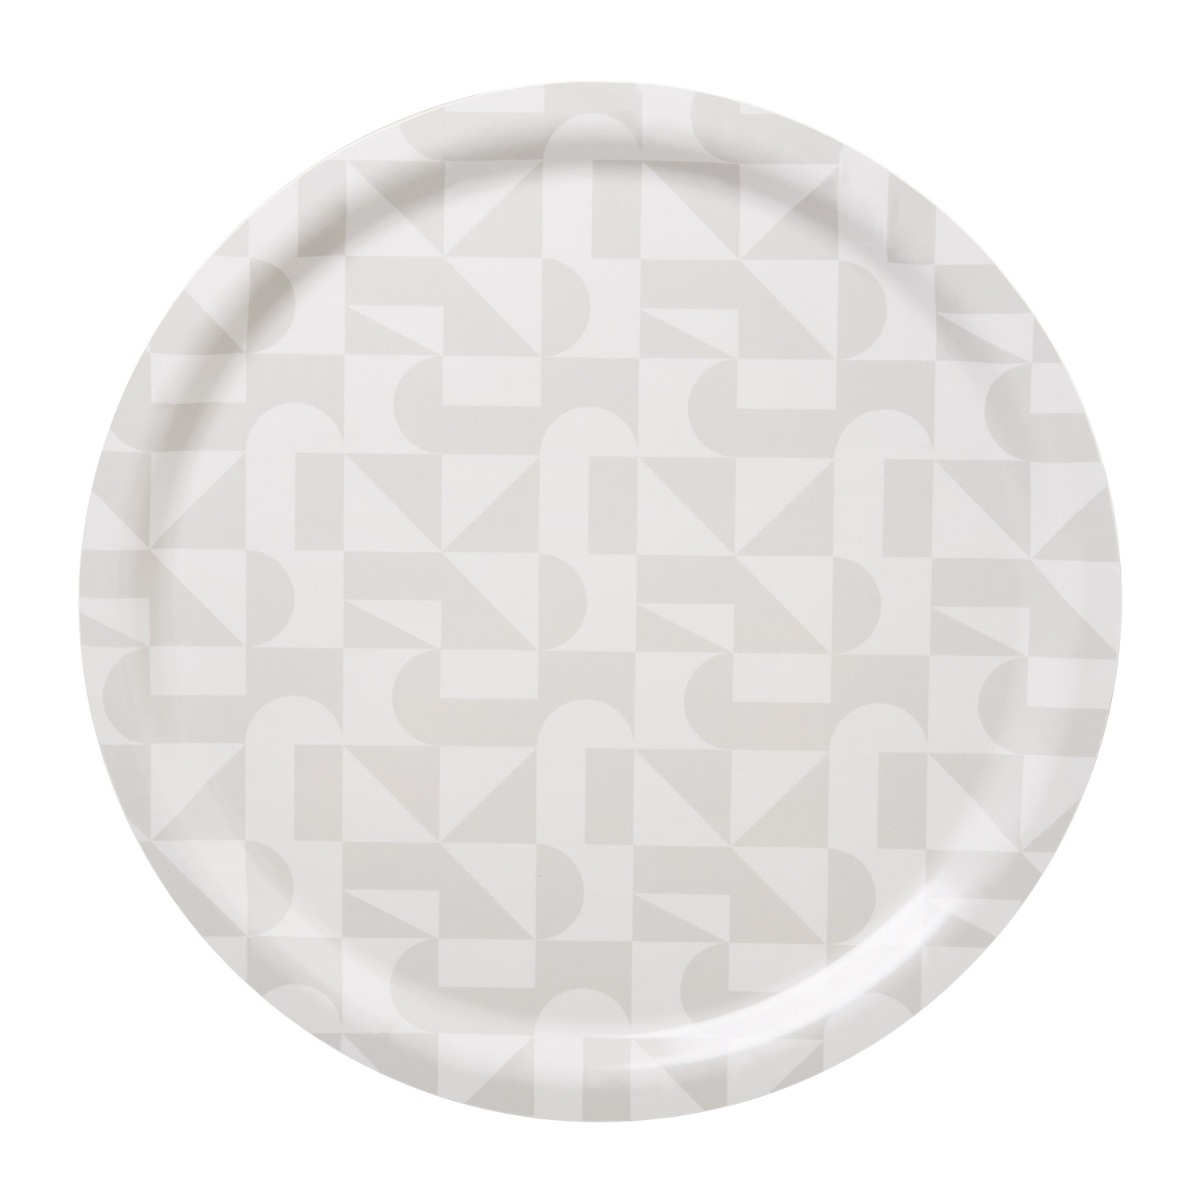 Designtorget Bricka till brickbord DT 49 cm beige